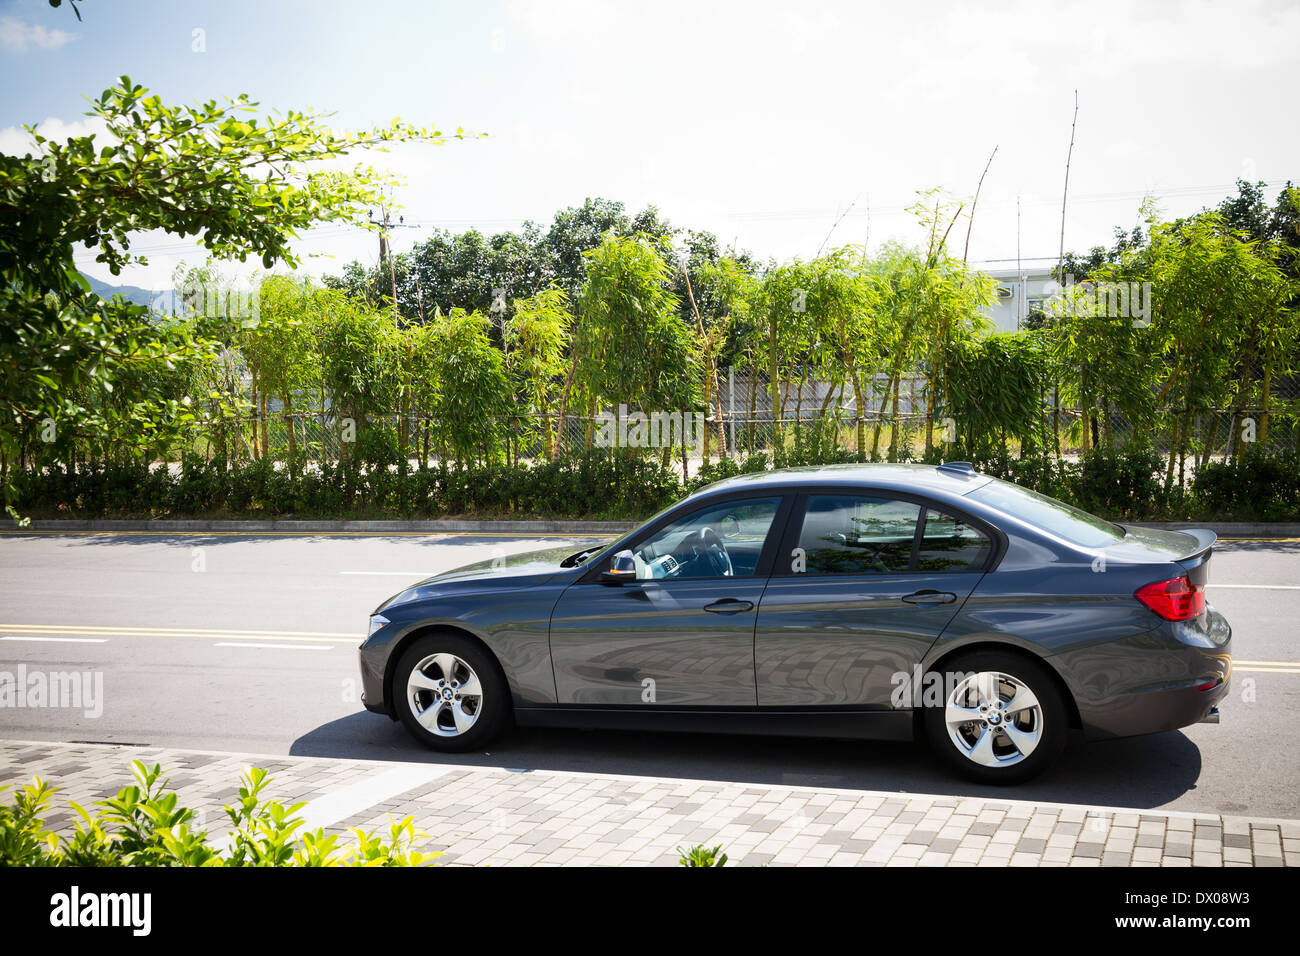 Sedán BMW 320d 2013 en color gris. Imagen De Stock